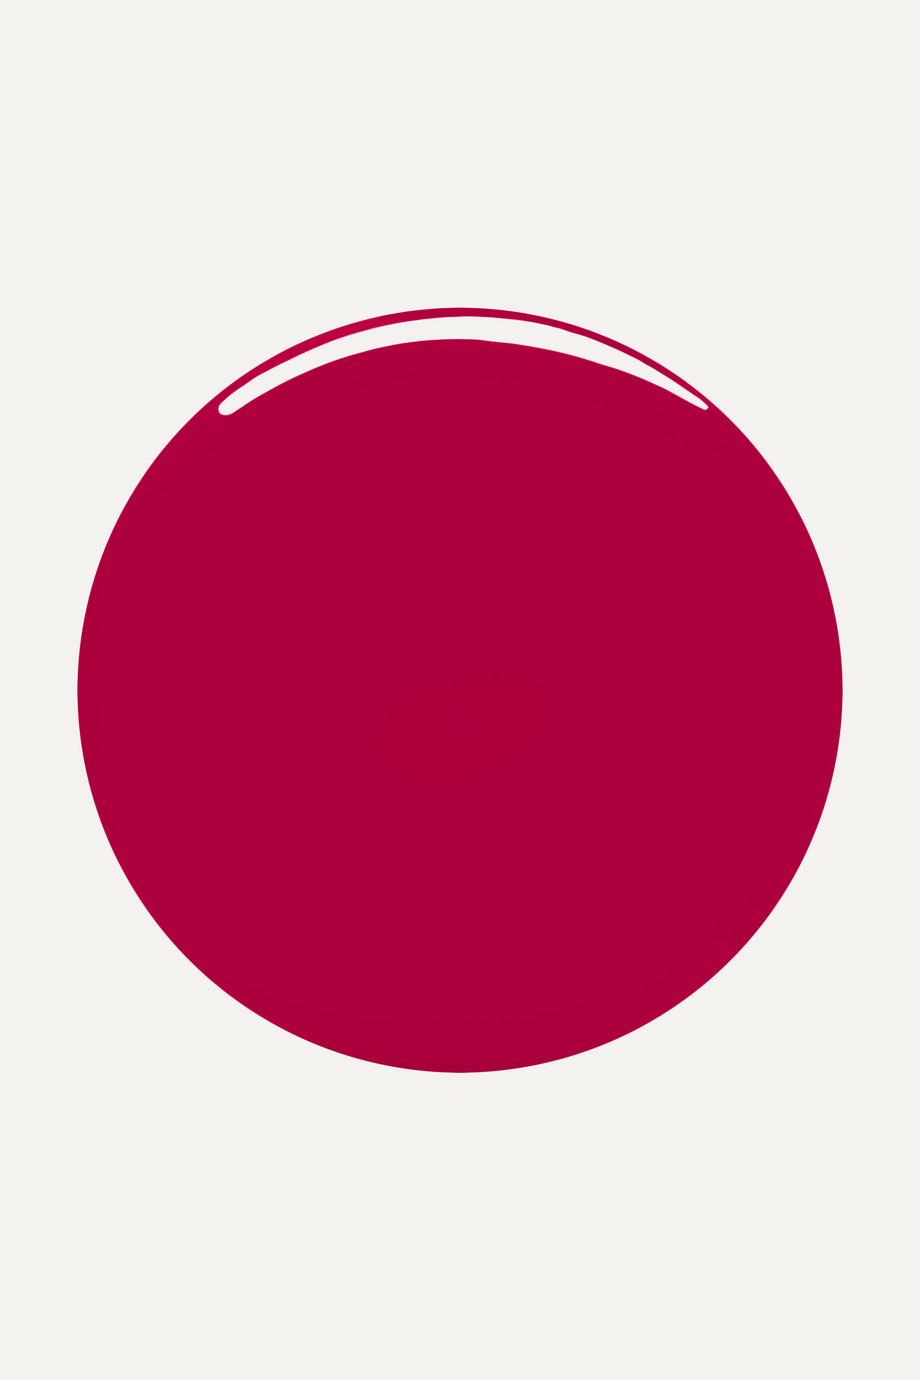 Christian Louboutin Beauty Nail Color - Lady Peep